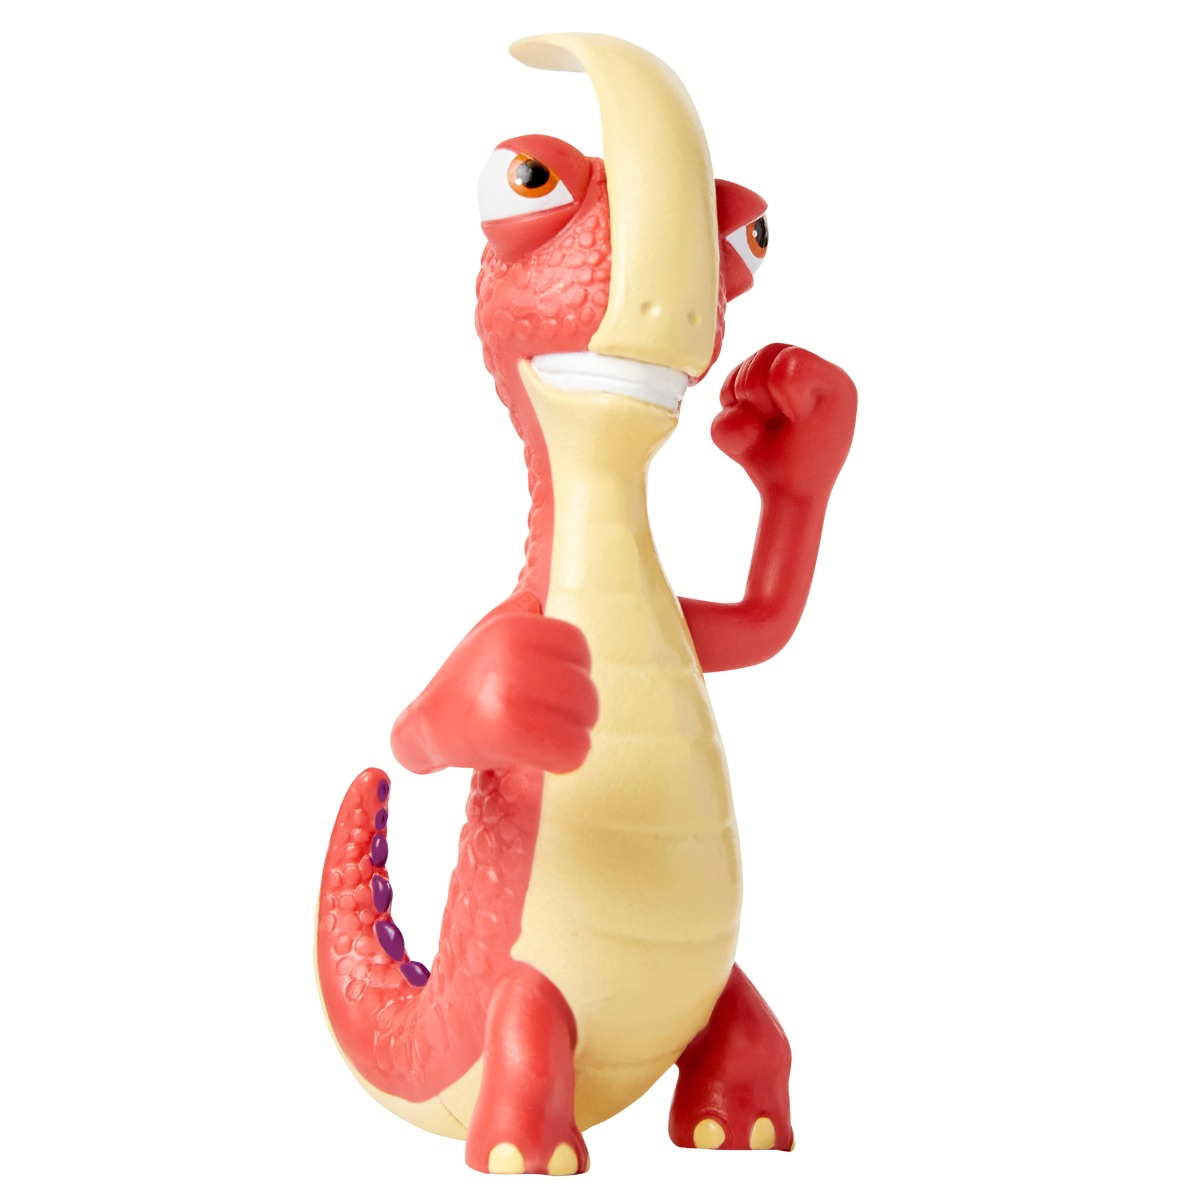 Figurina articulata dinozaur Gigantosaurus, Rocky